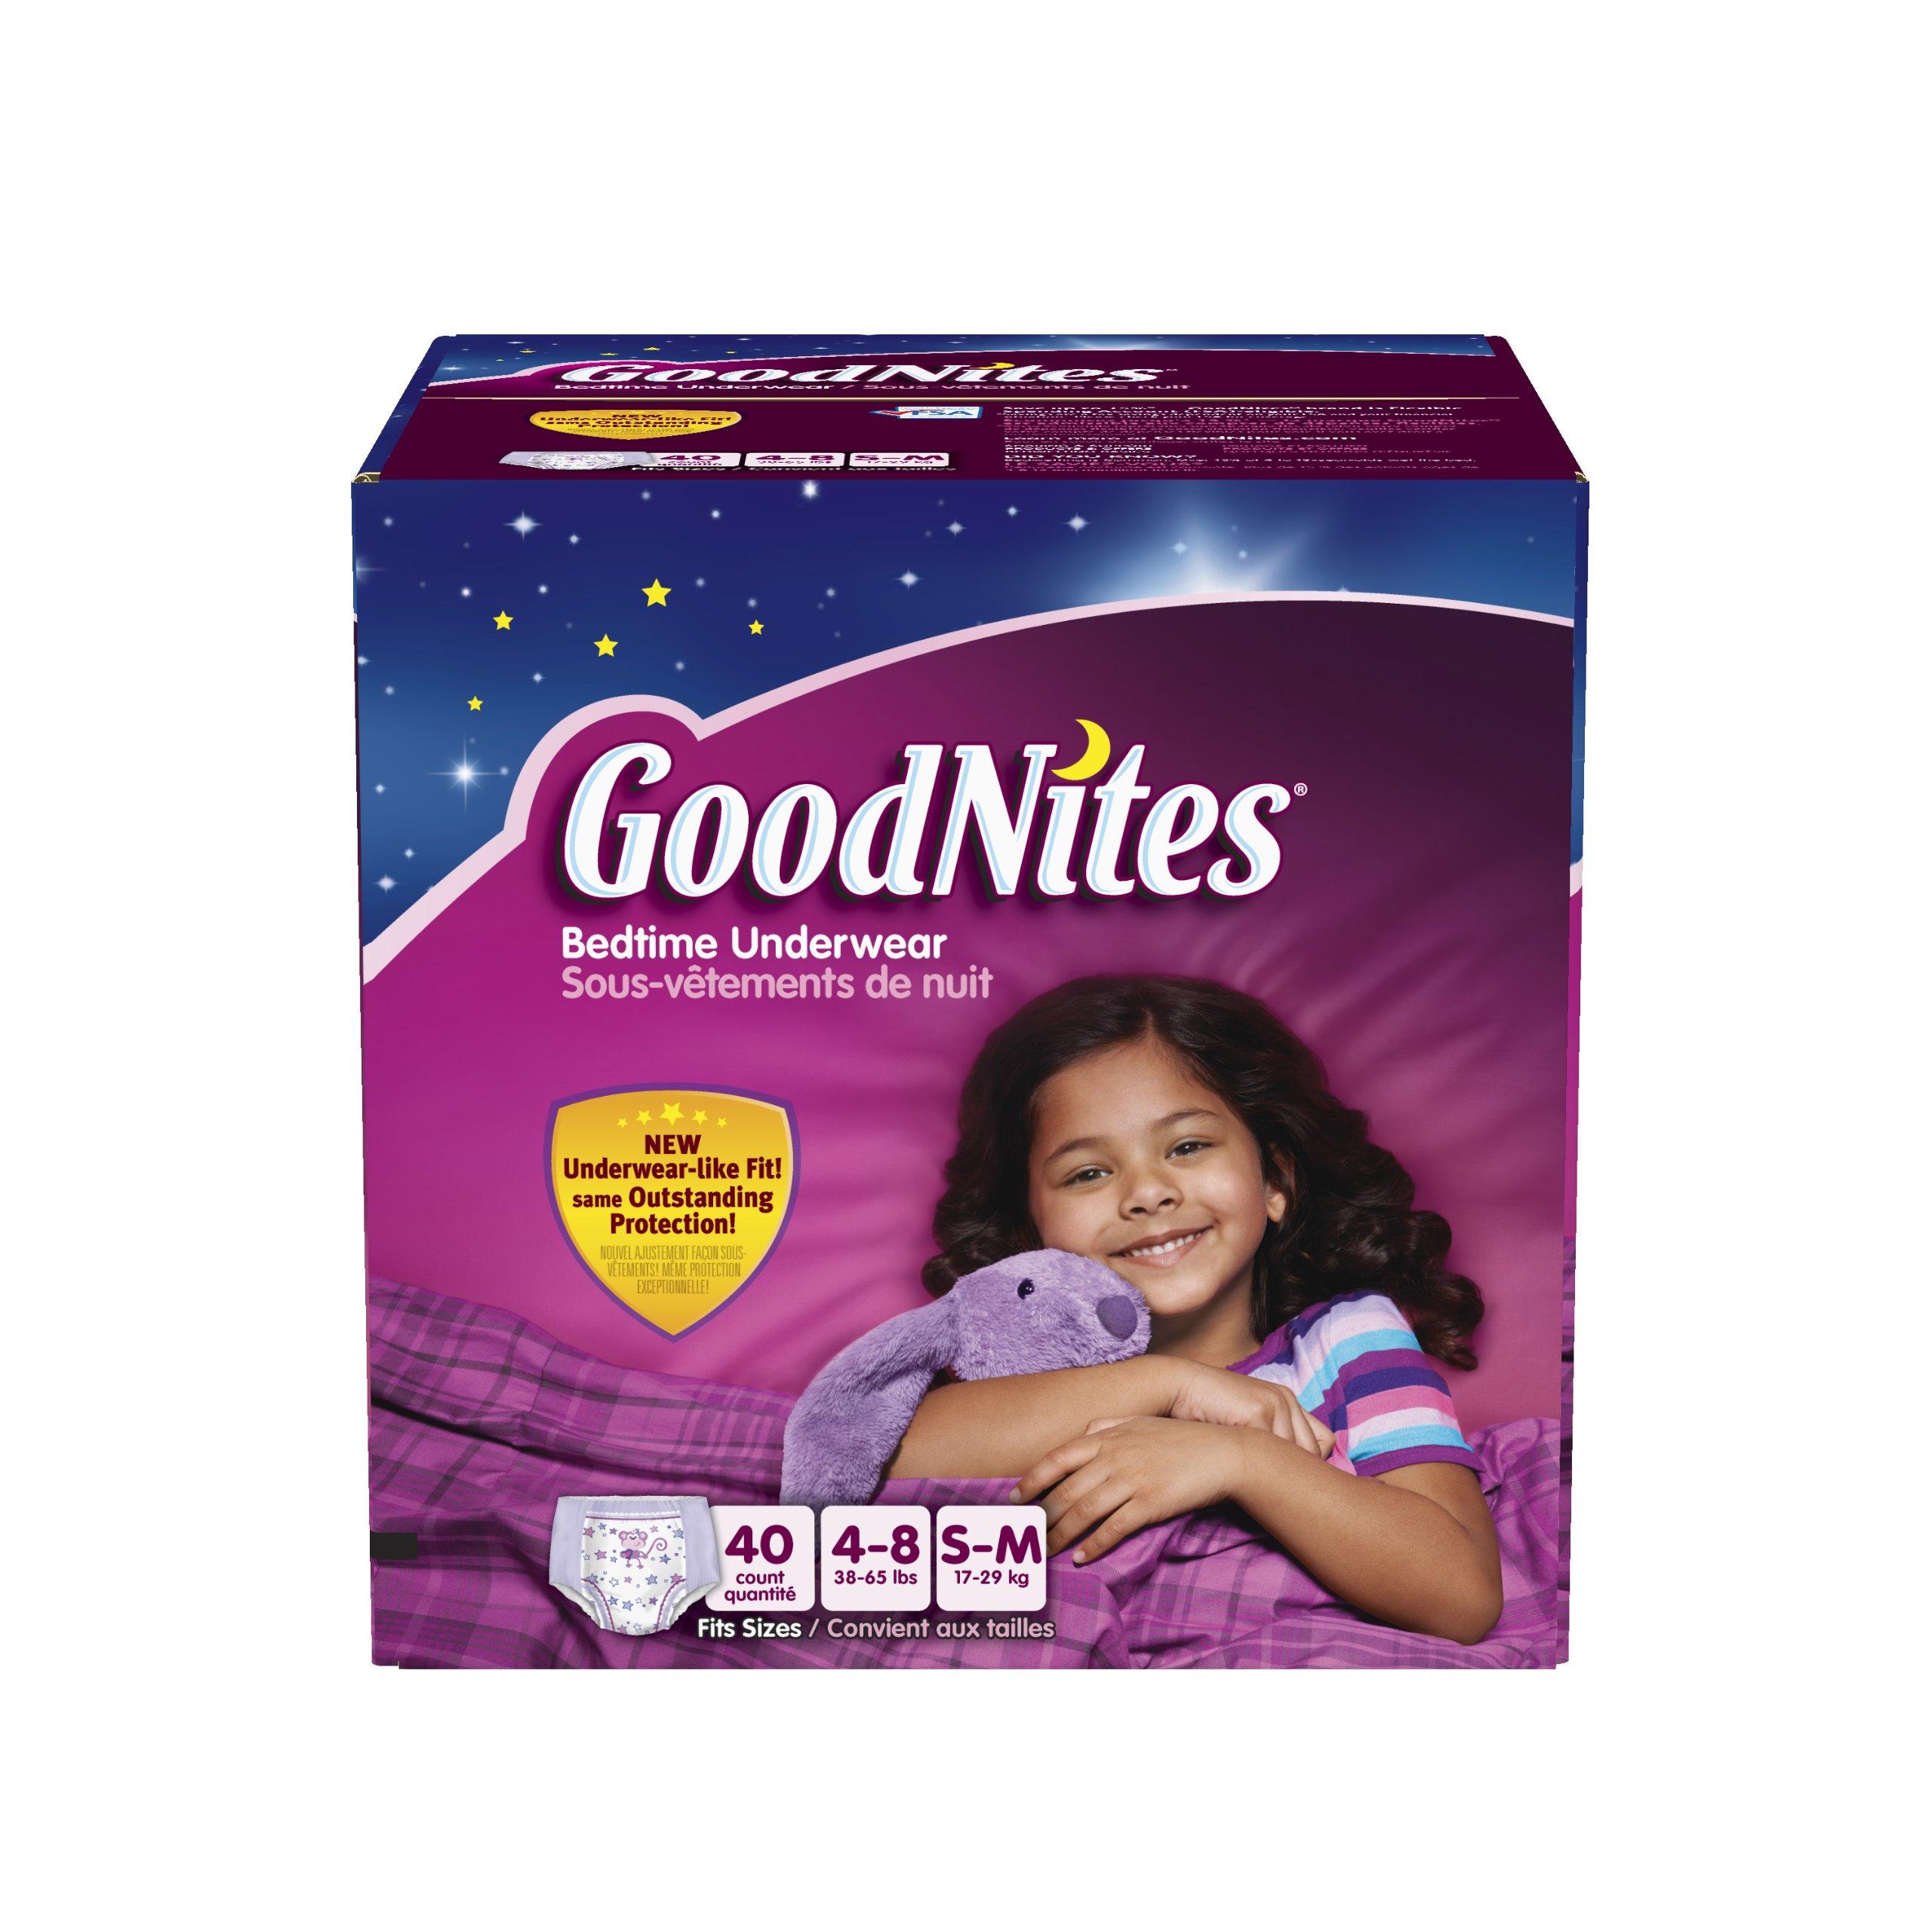 GoodNites Bedtime Pants for Girls, Small/Medium, 40 count